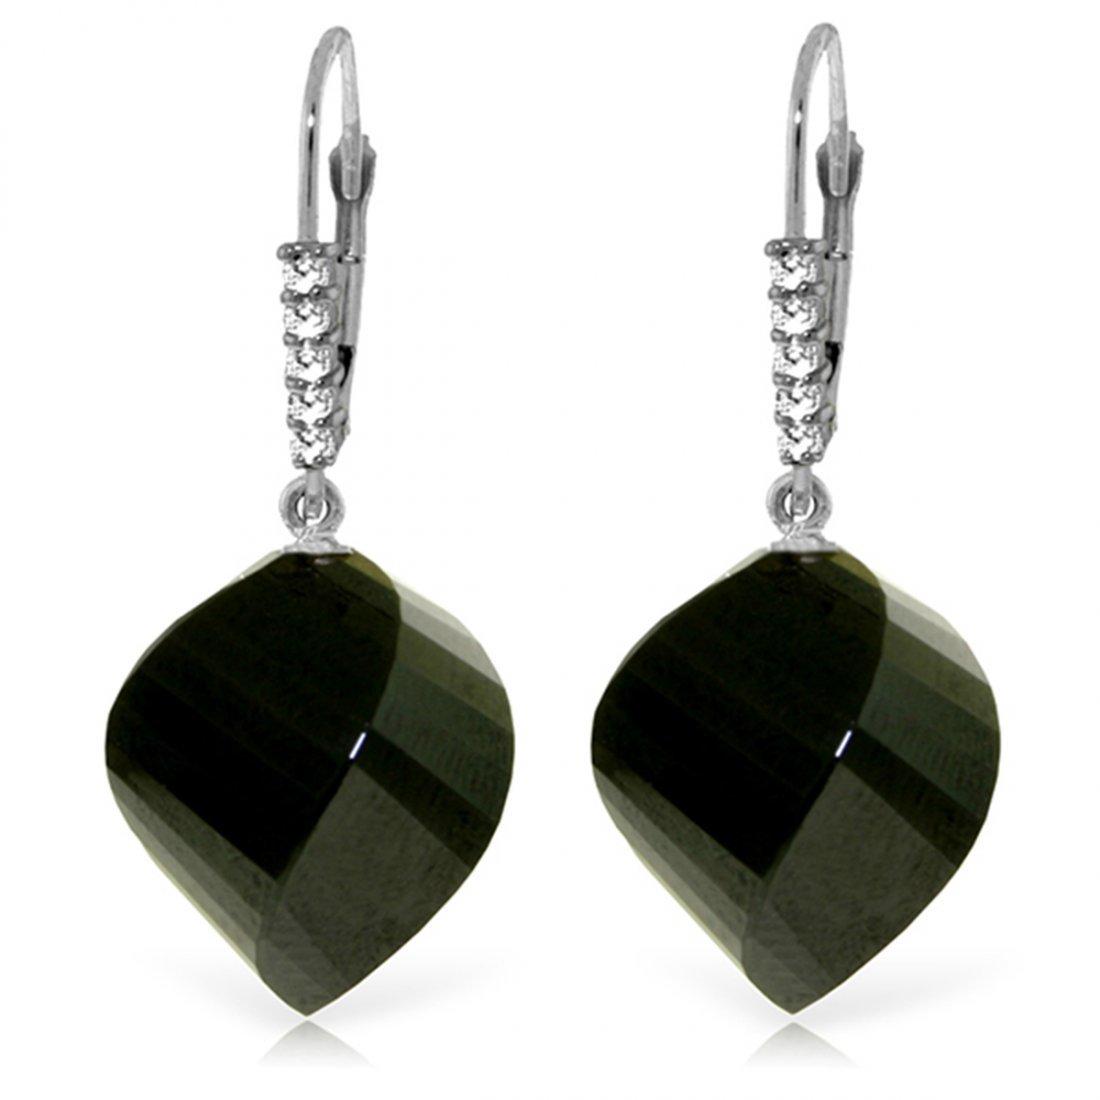 14k Briolette Black Spinel with Diamond Earrings